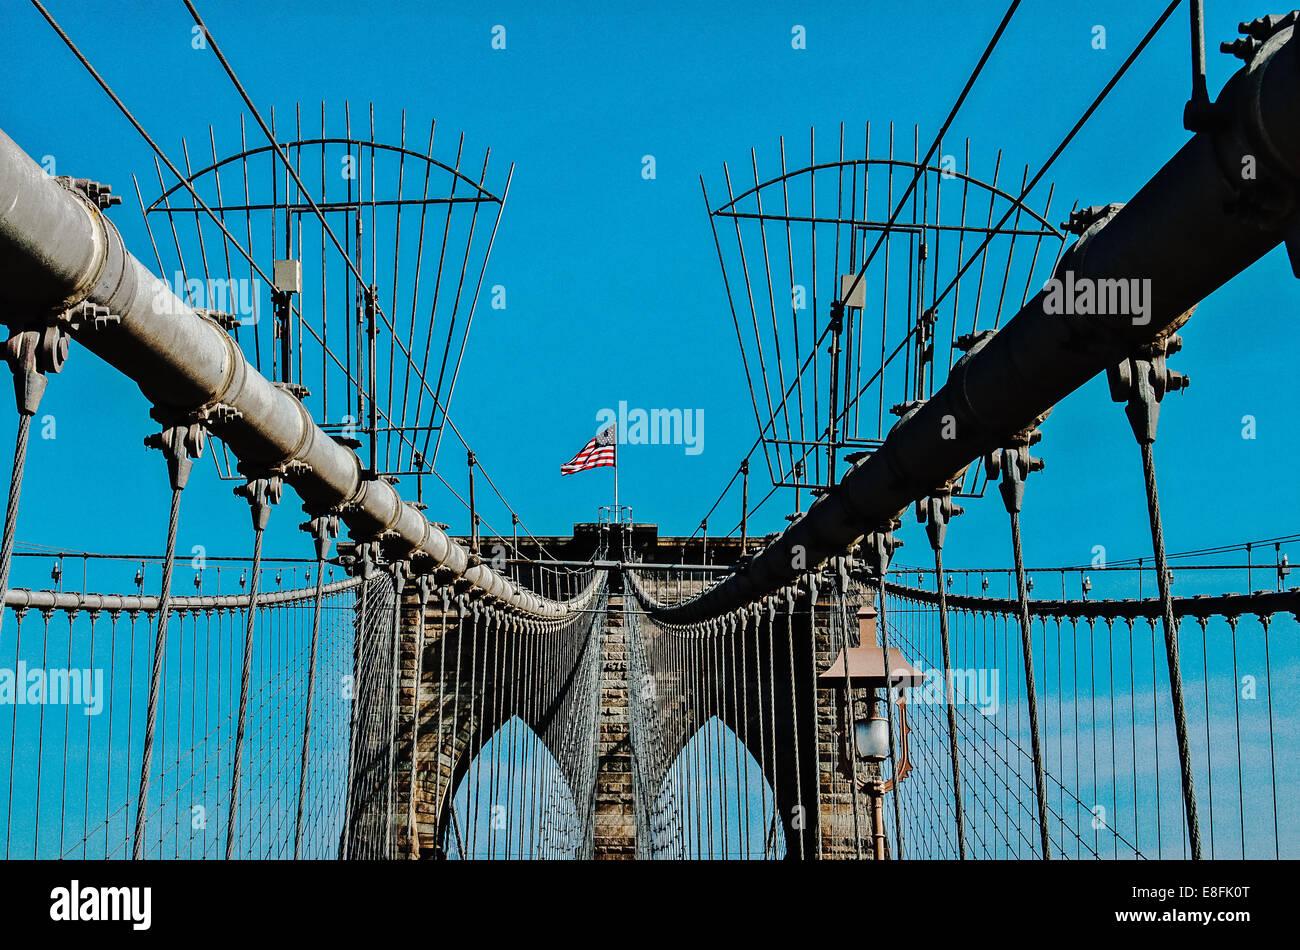 USA, New York State, New York City, Brooklyn Bridge mit Flagge Stockbild